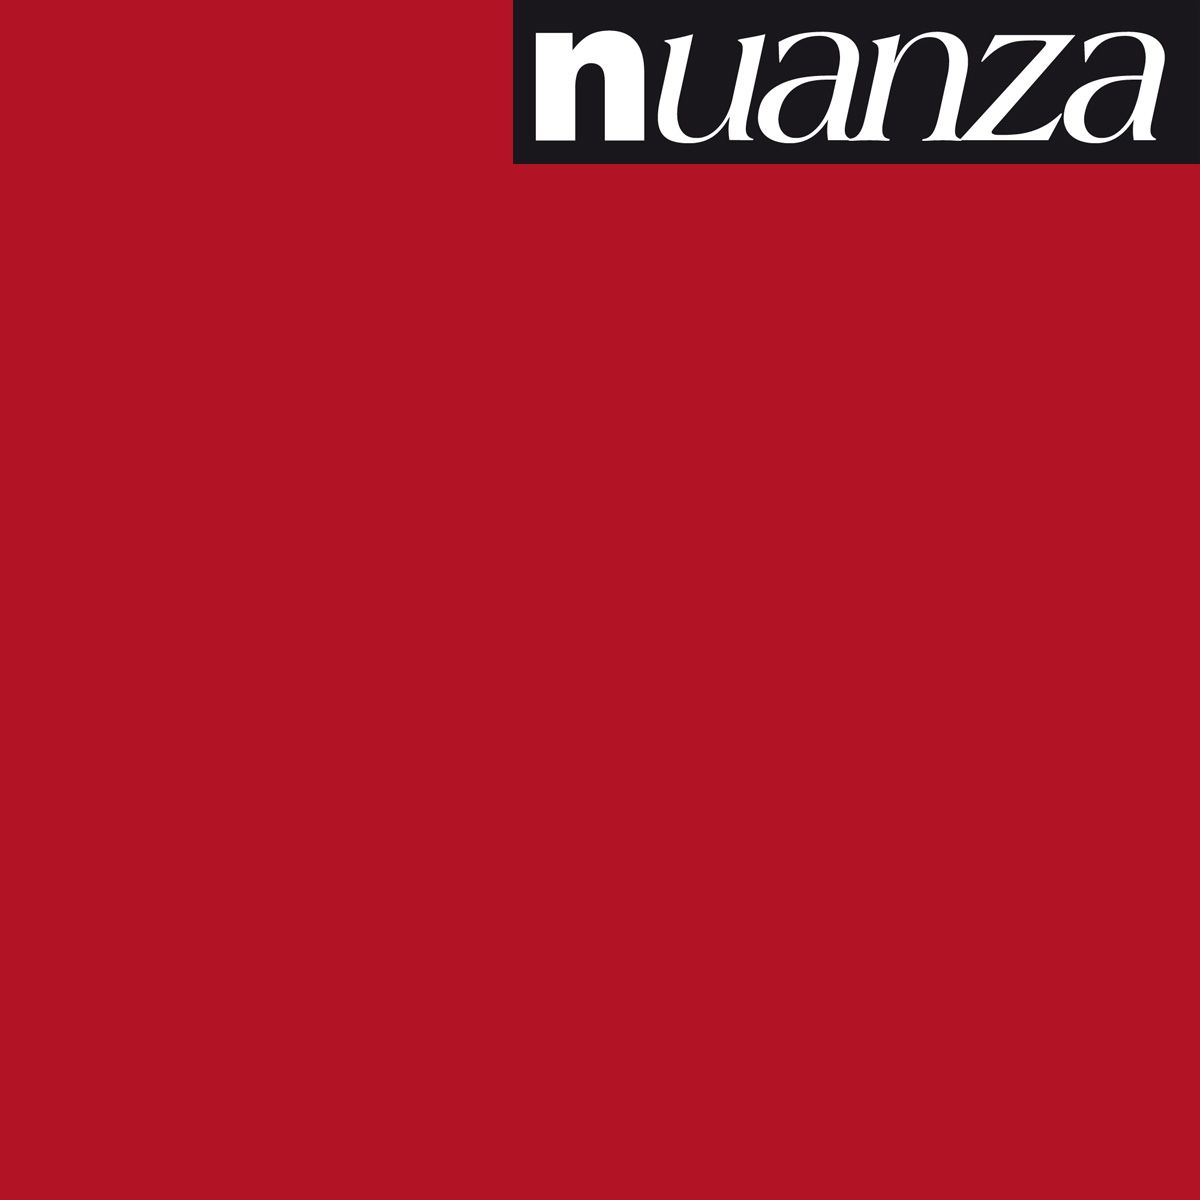 Peinture cerise satin multisupports Nuanza 2.5l